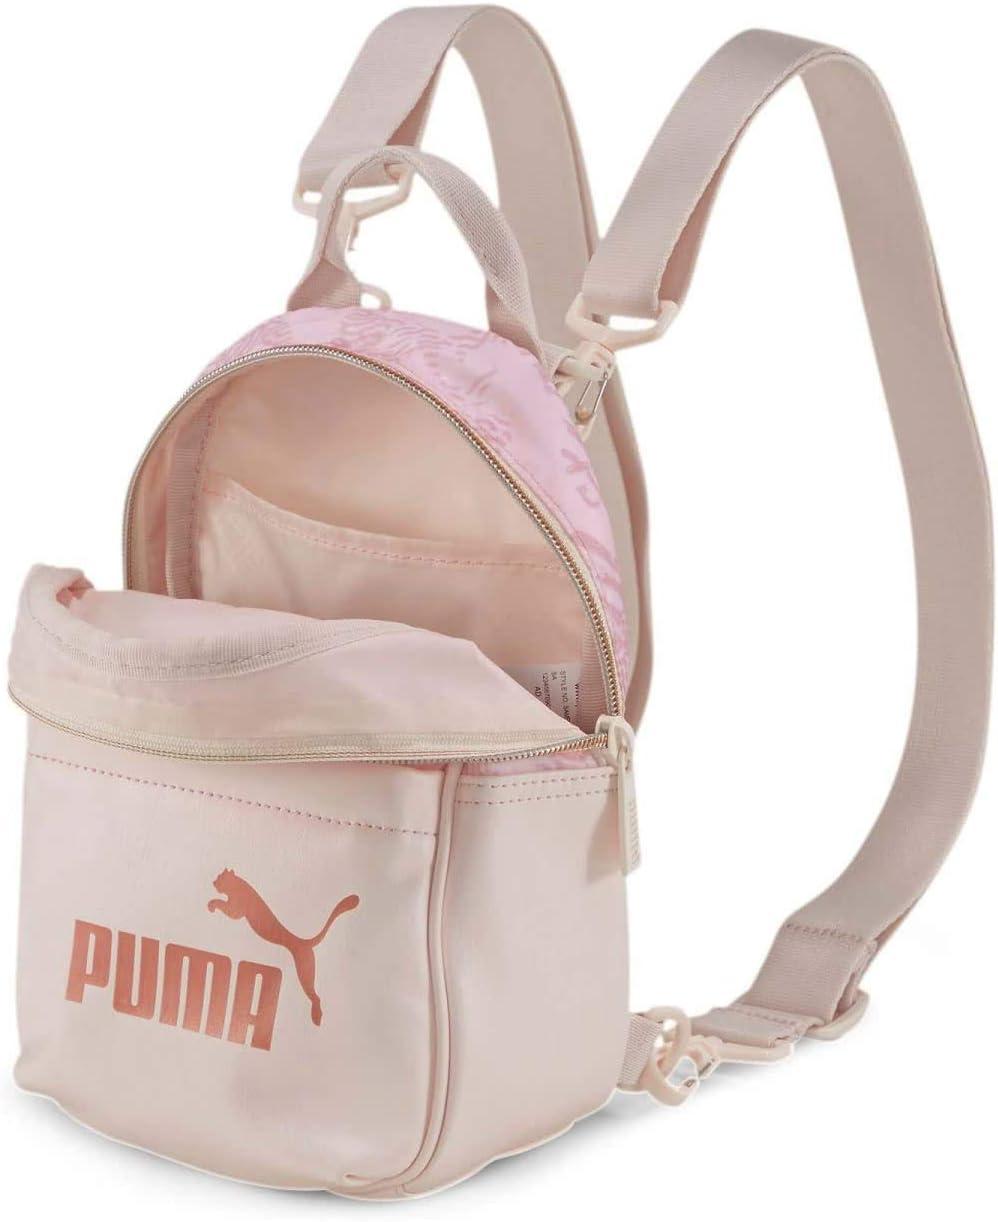 Dibujar implícito Ataque de nervios  PUMA Minime Backpack WMN Core Up Minime Backpack Rosewater: Amazon.es:  Zapatos y complementos